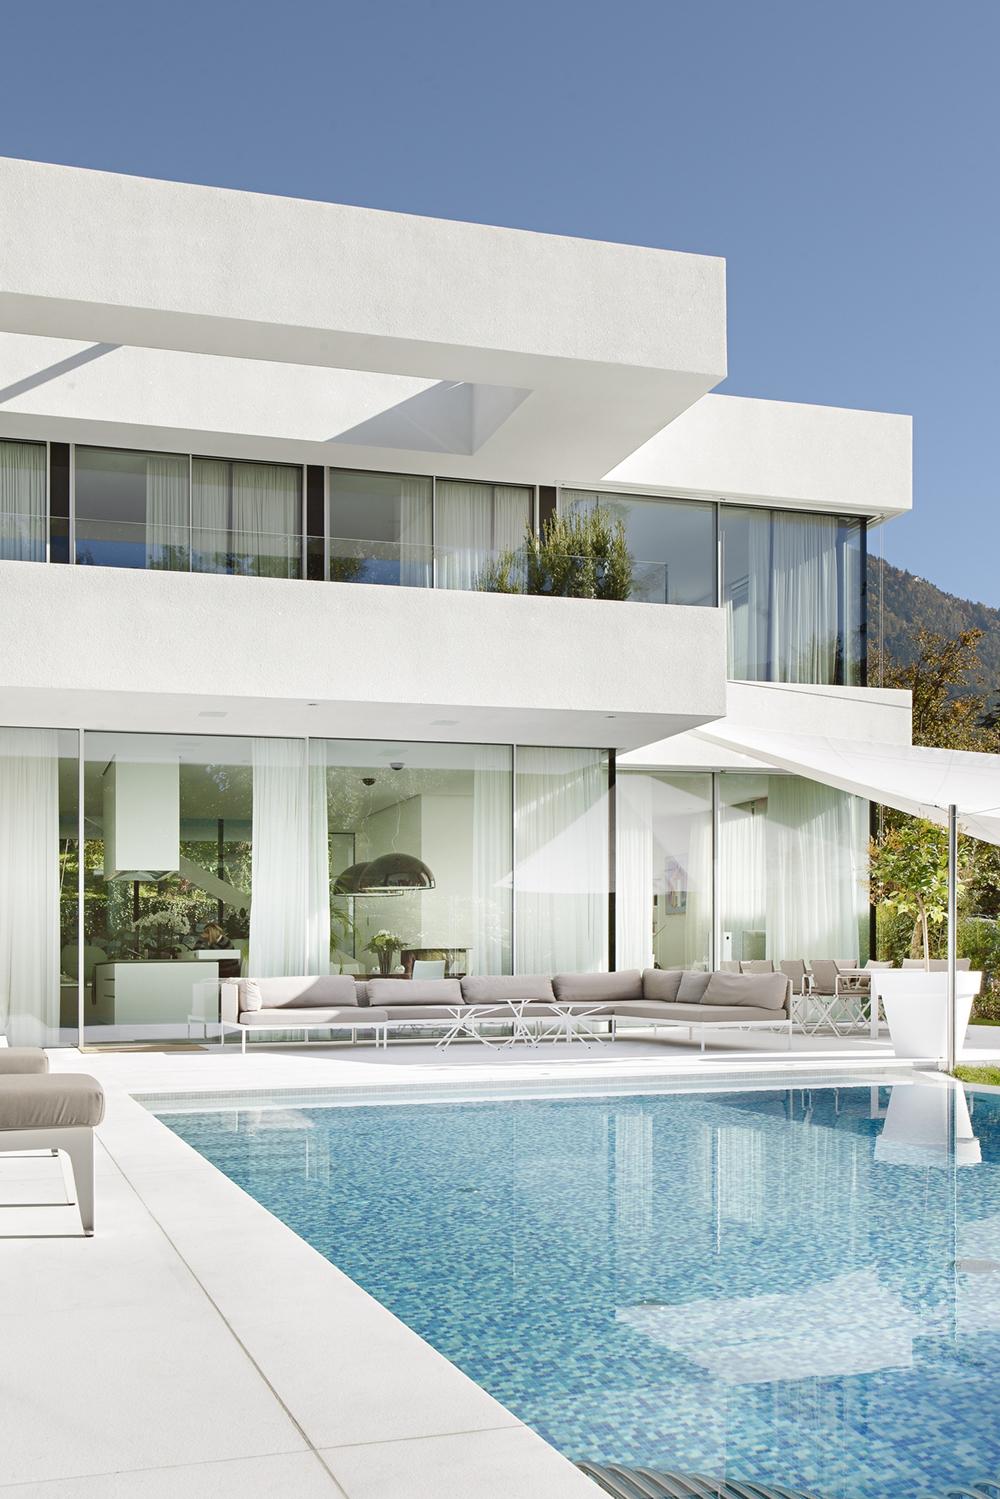 ... In Best Exterior House Design Ideas Courtesy Of Monovolume Architecture  + Design White Concrete And Glass Exterior Facade